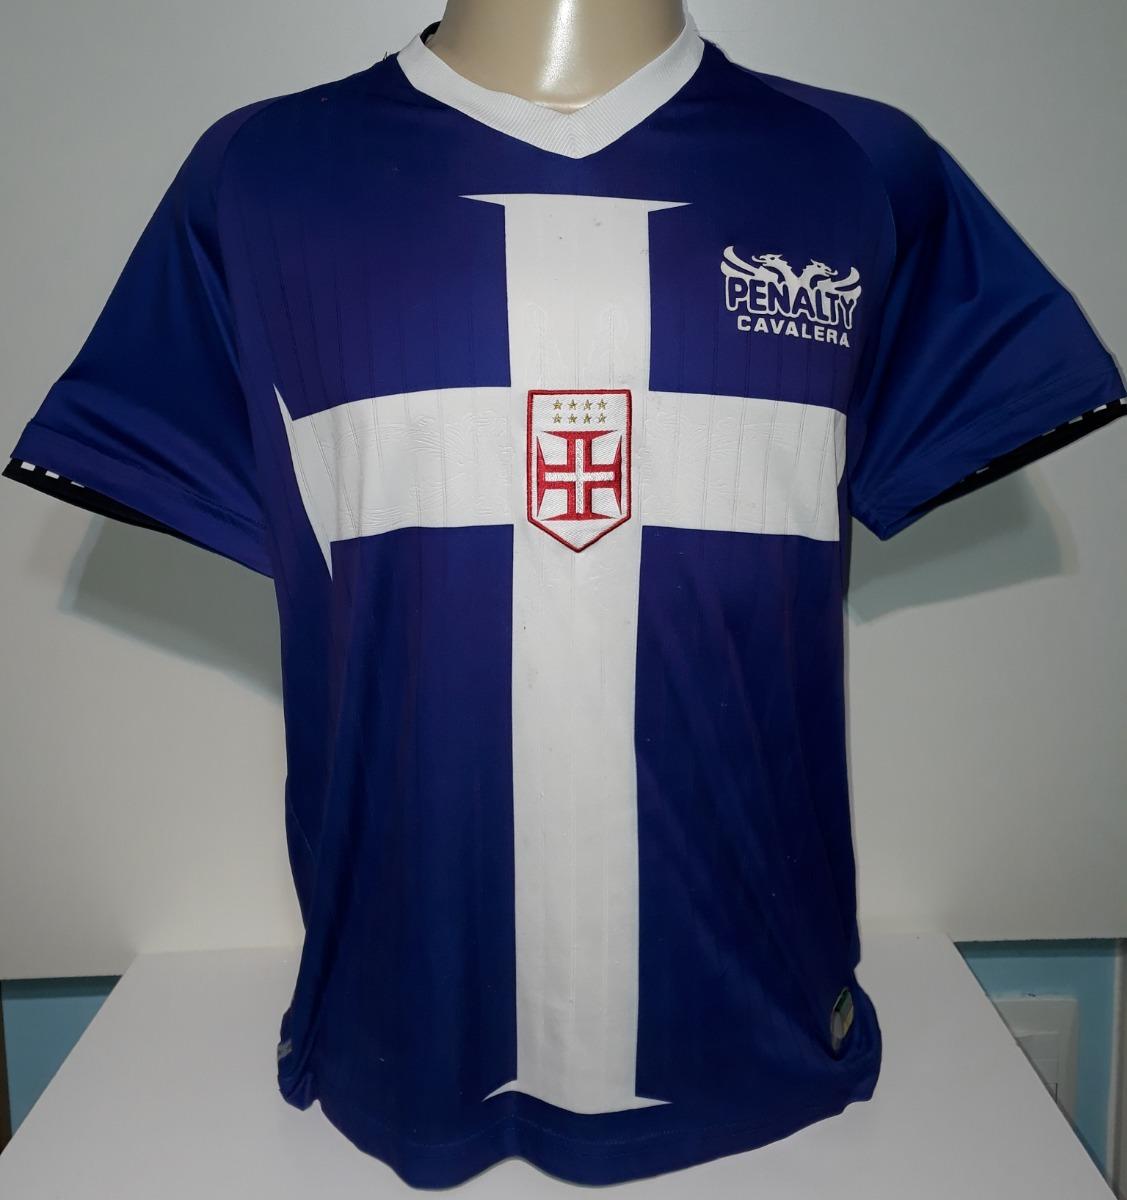 36b8c018fd camisa vasco templária azul penalty cavalera 2012 - 89. Carregando zoom.